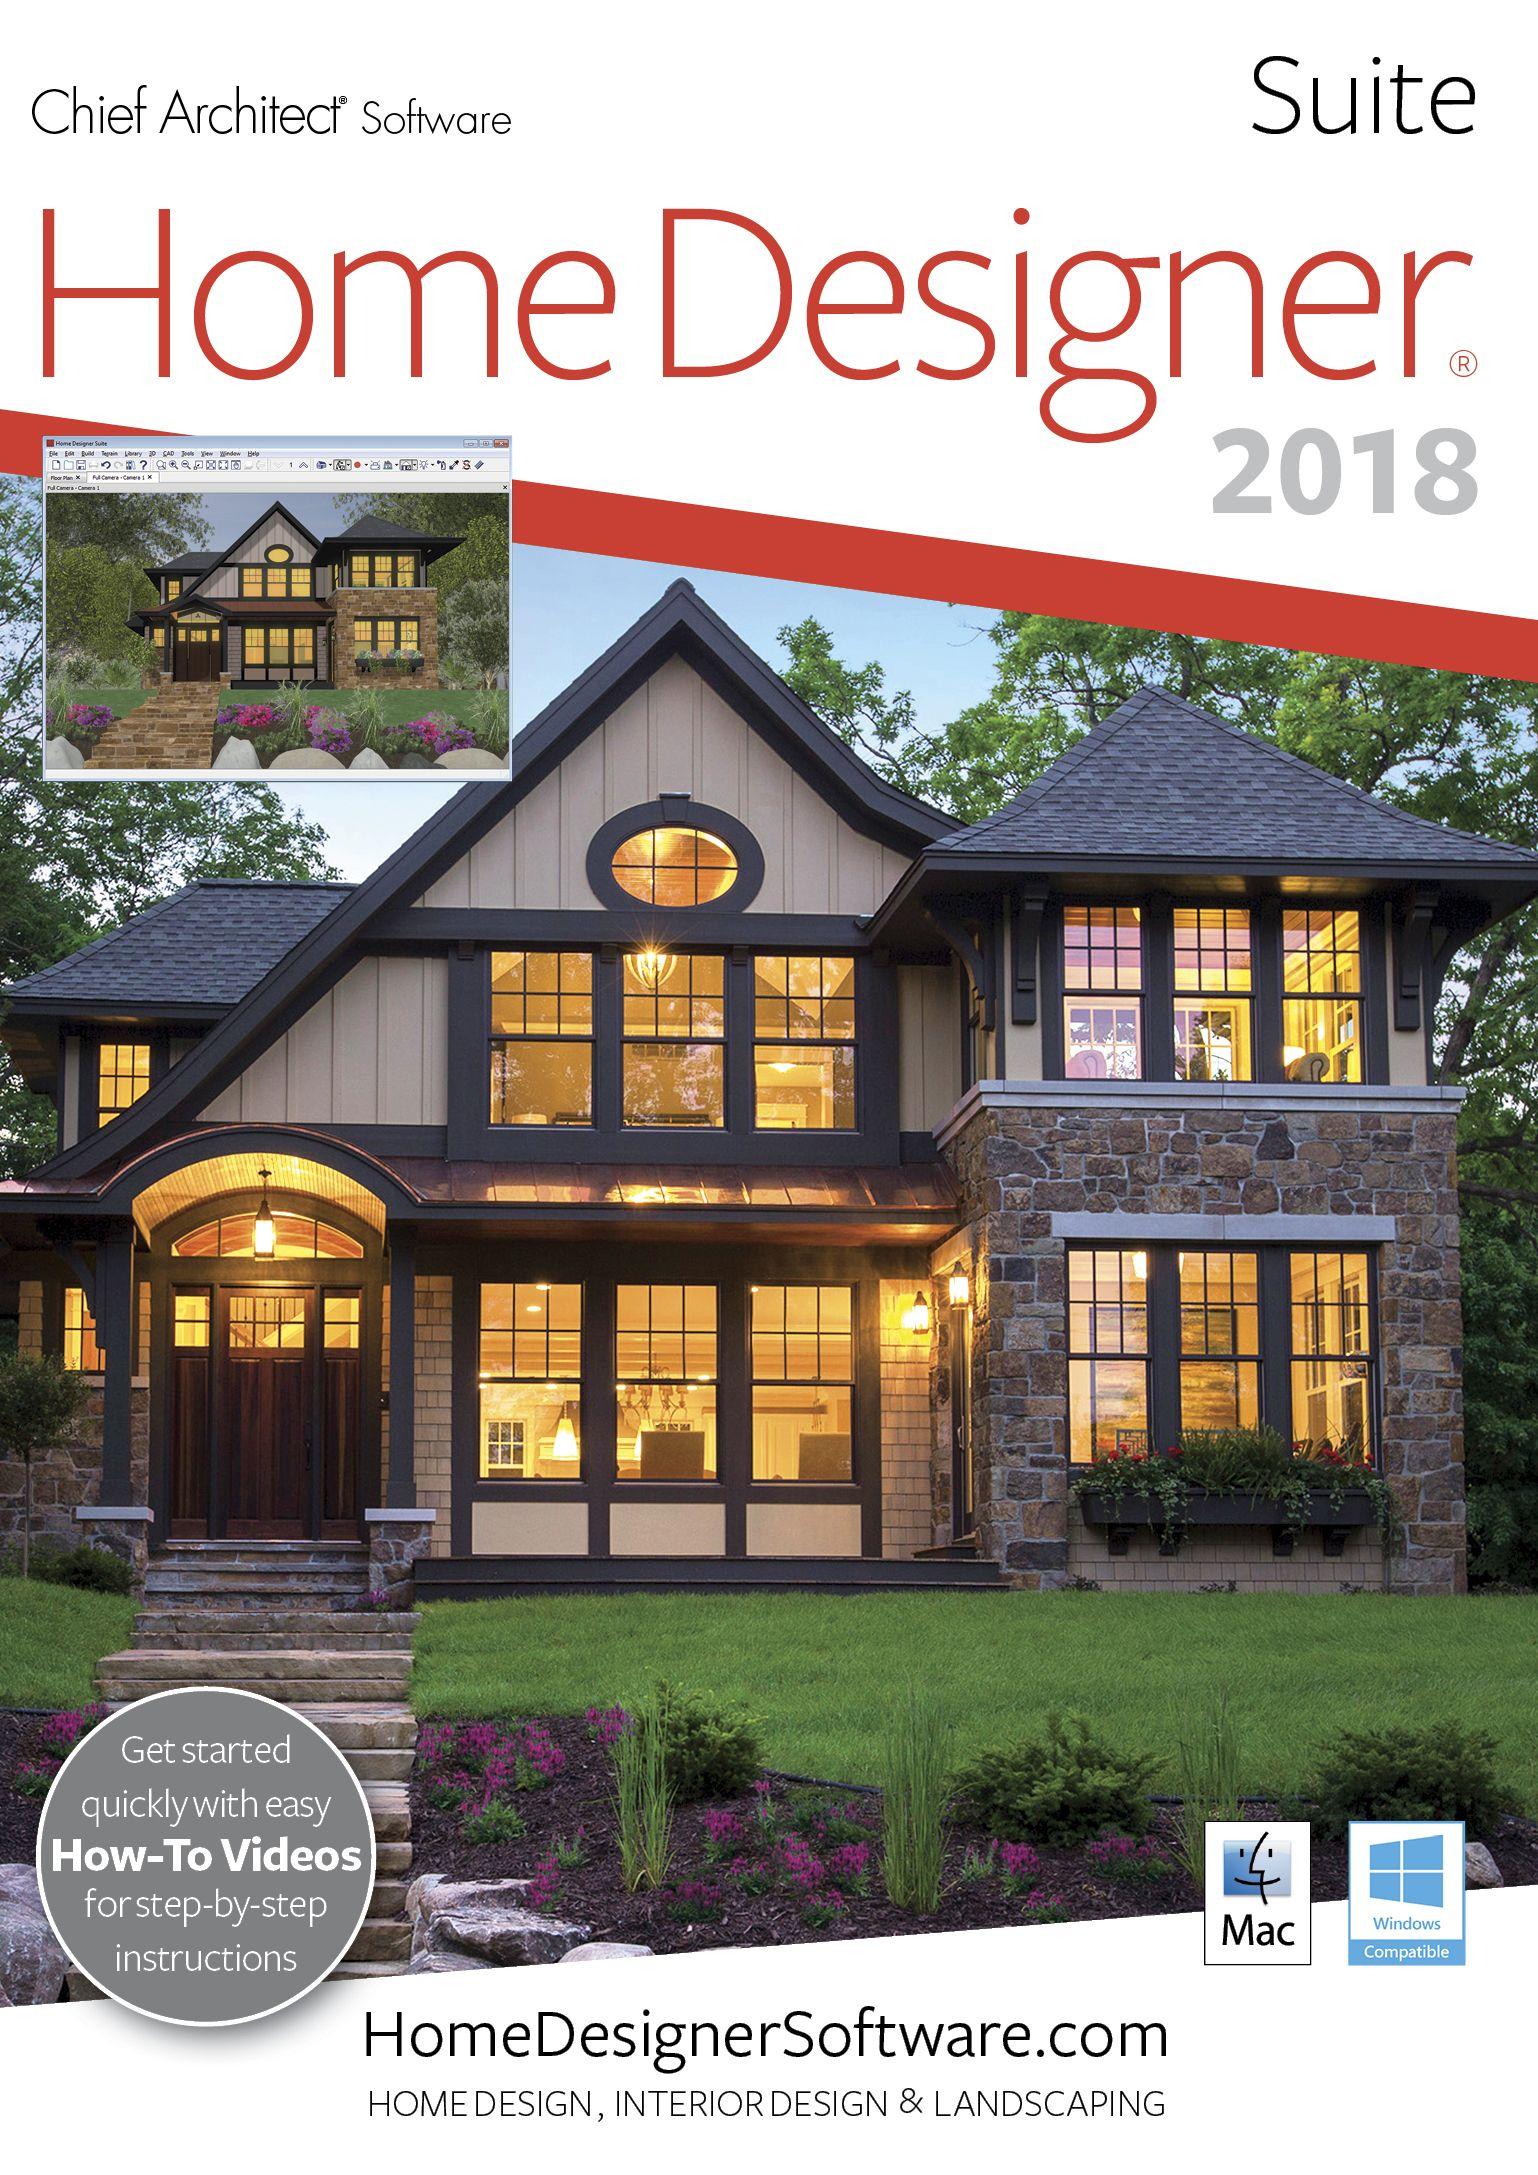 Home Designer Suite 2018 Pc Download Download Home Designer Suite Home Design Software Chief Architect